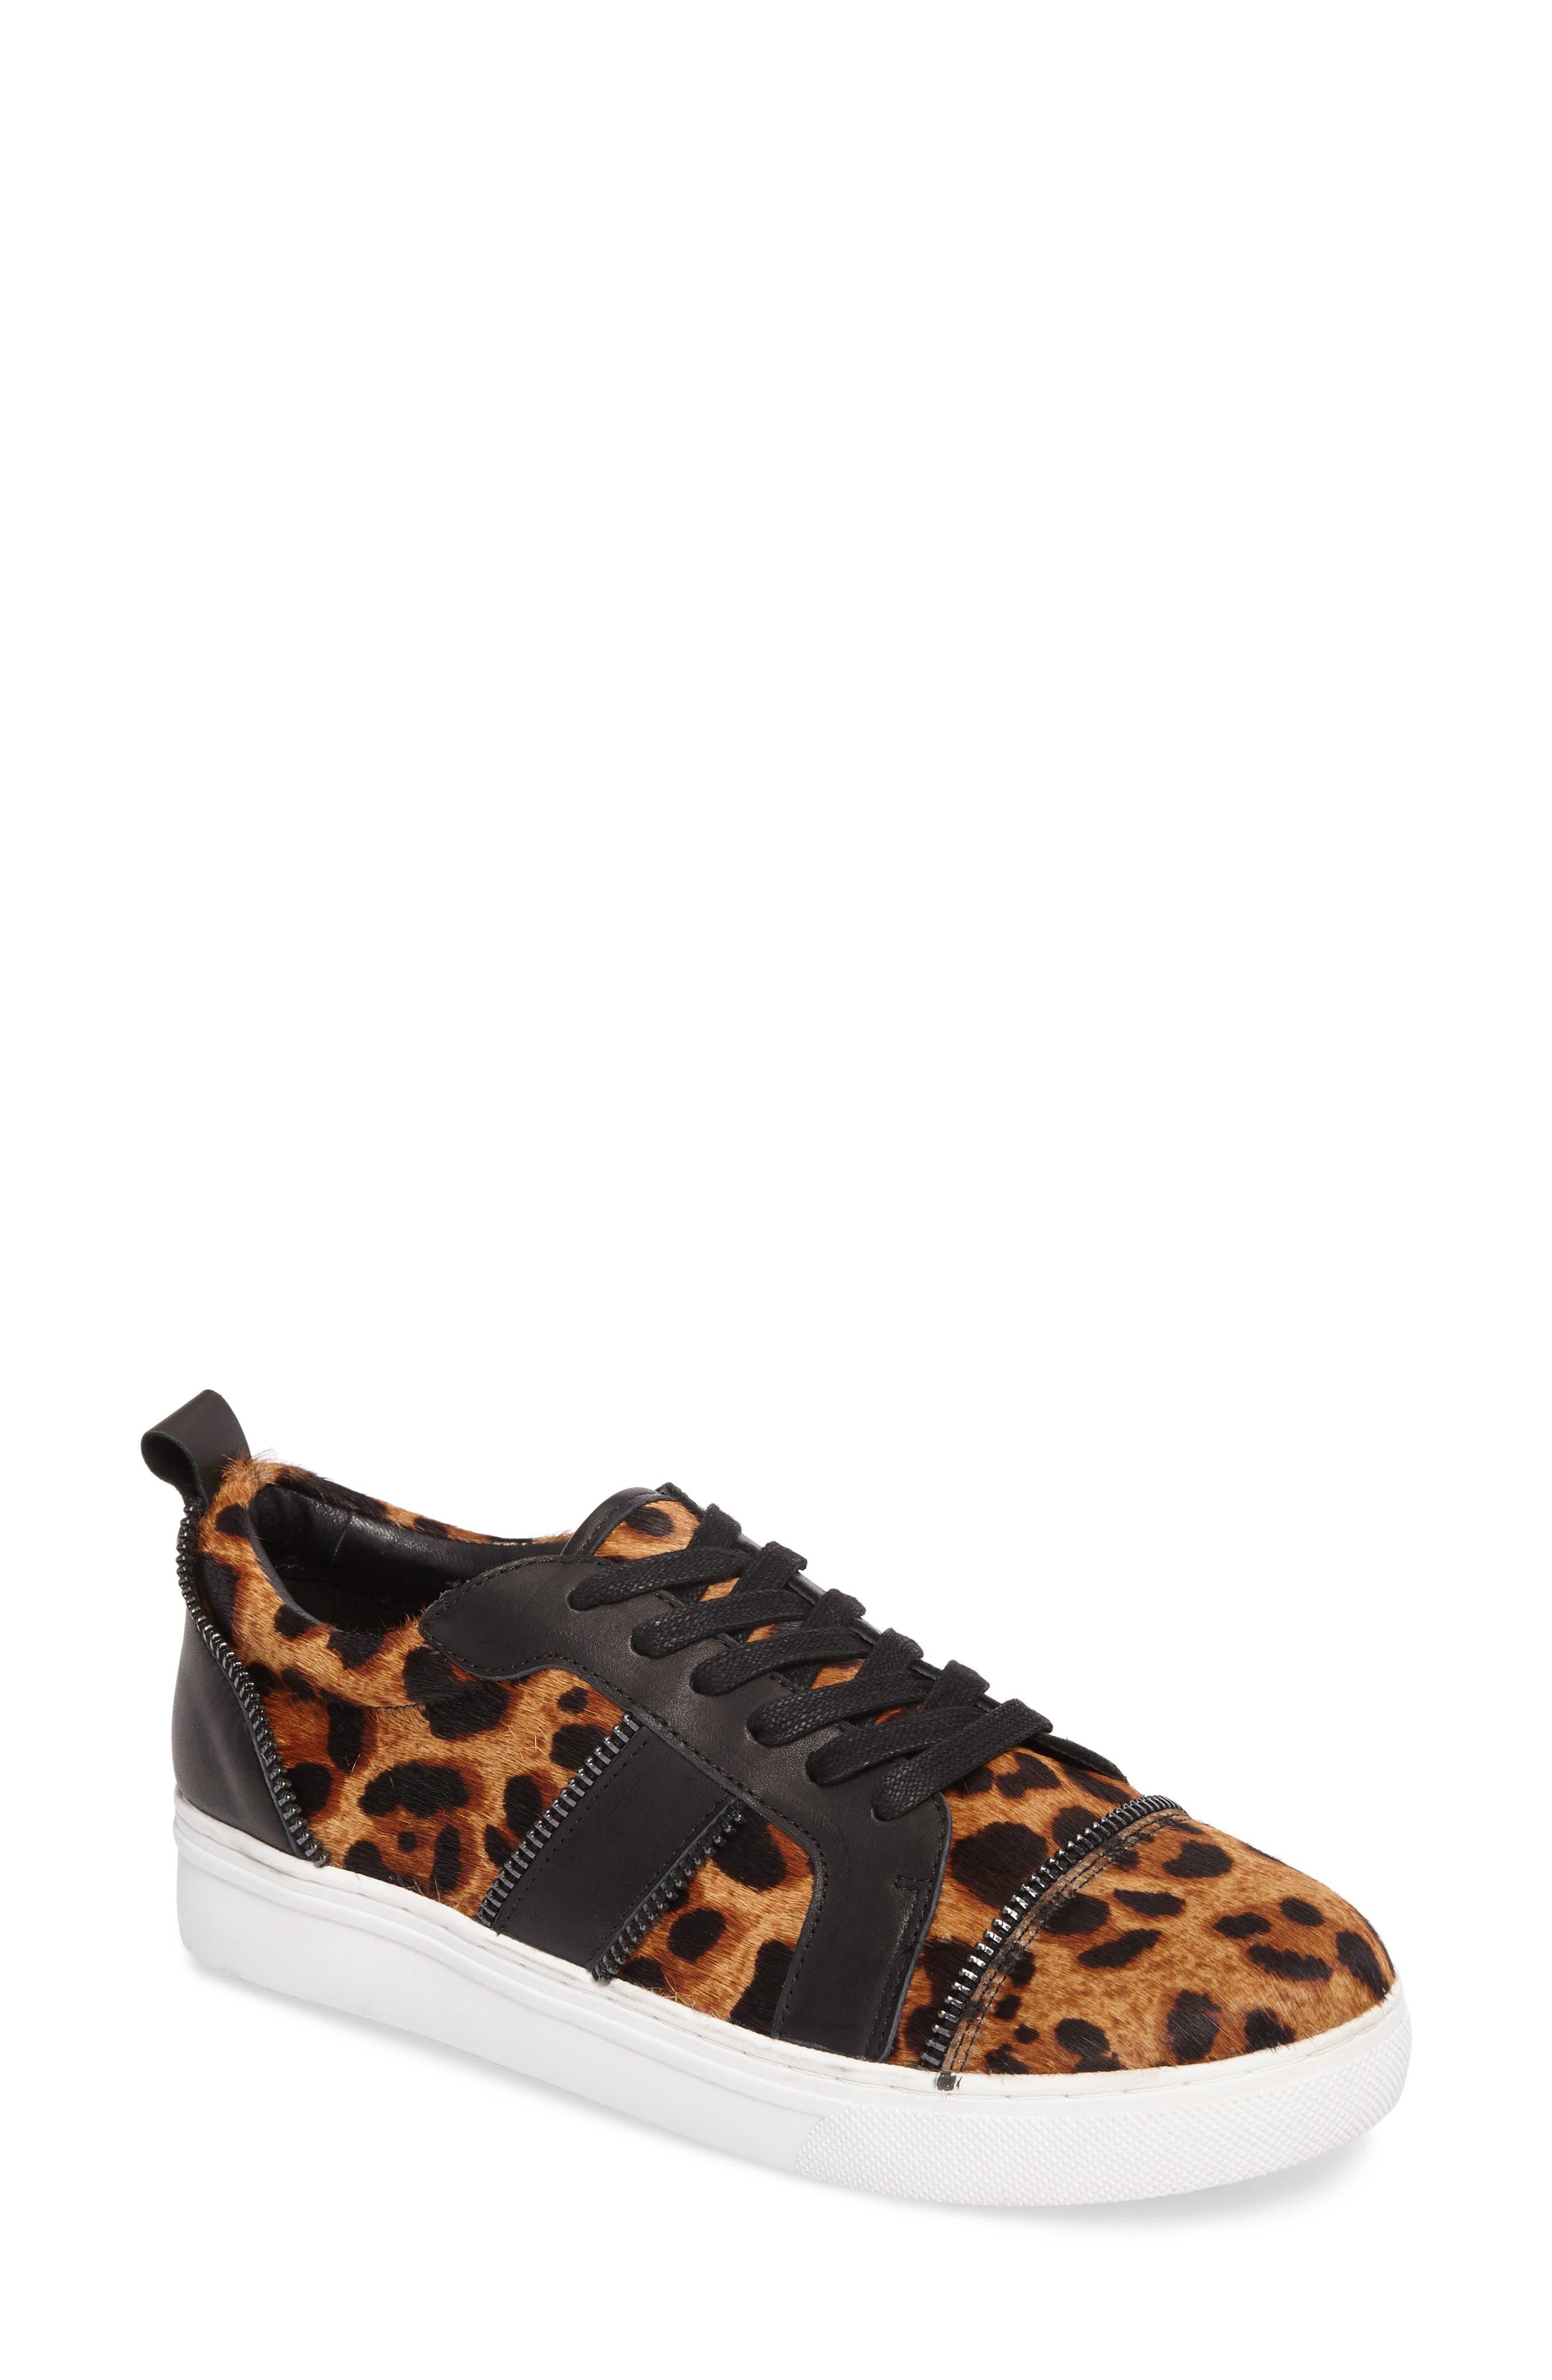 Harvey Genuine Calf Hair Sneaker,                             Main thumbnail 1, color,                             Leopard Calf Hair